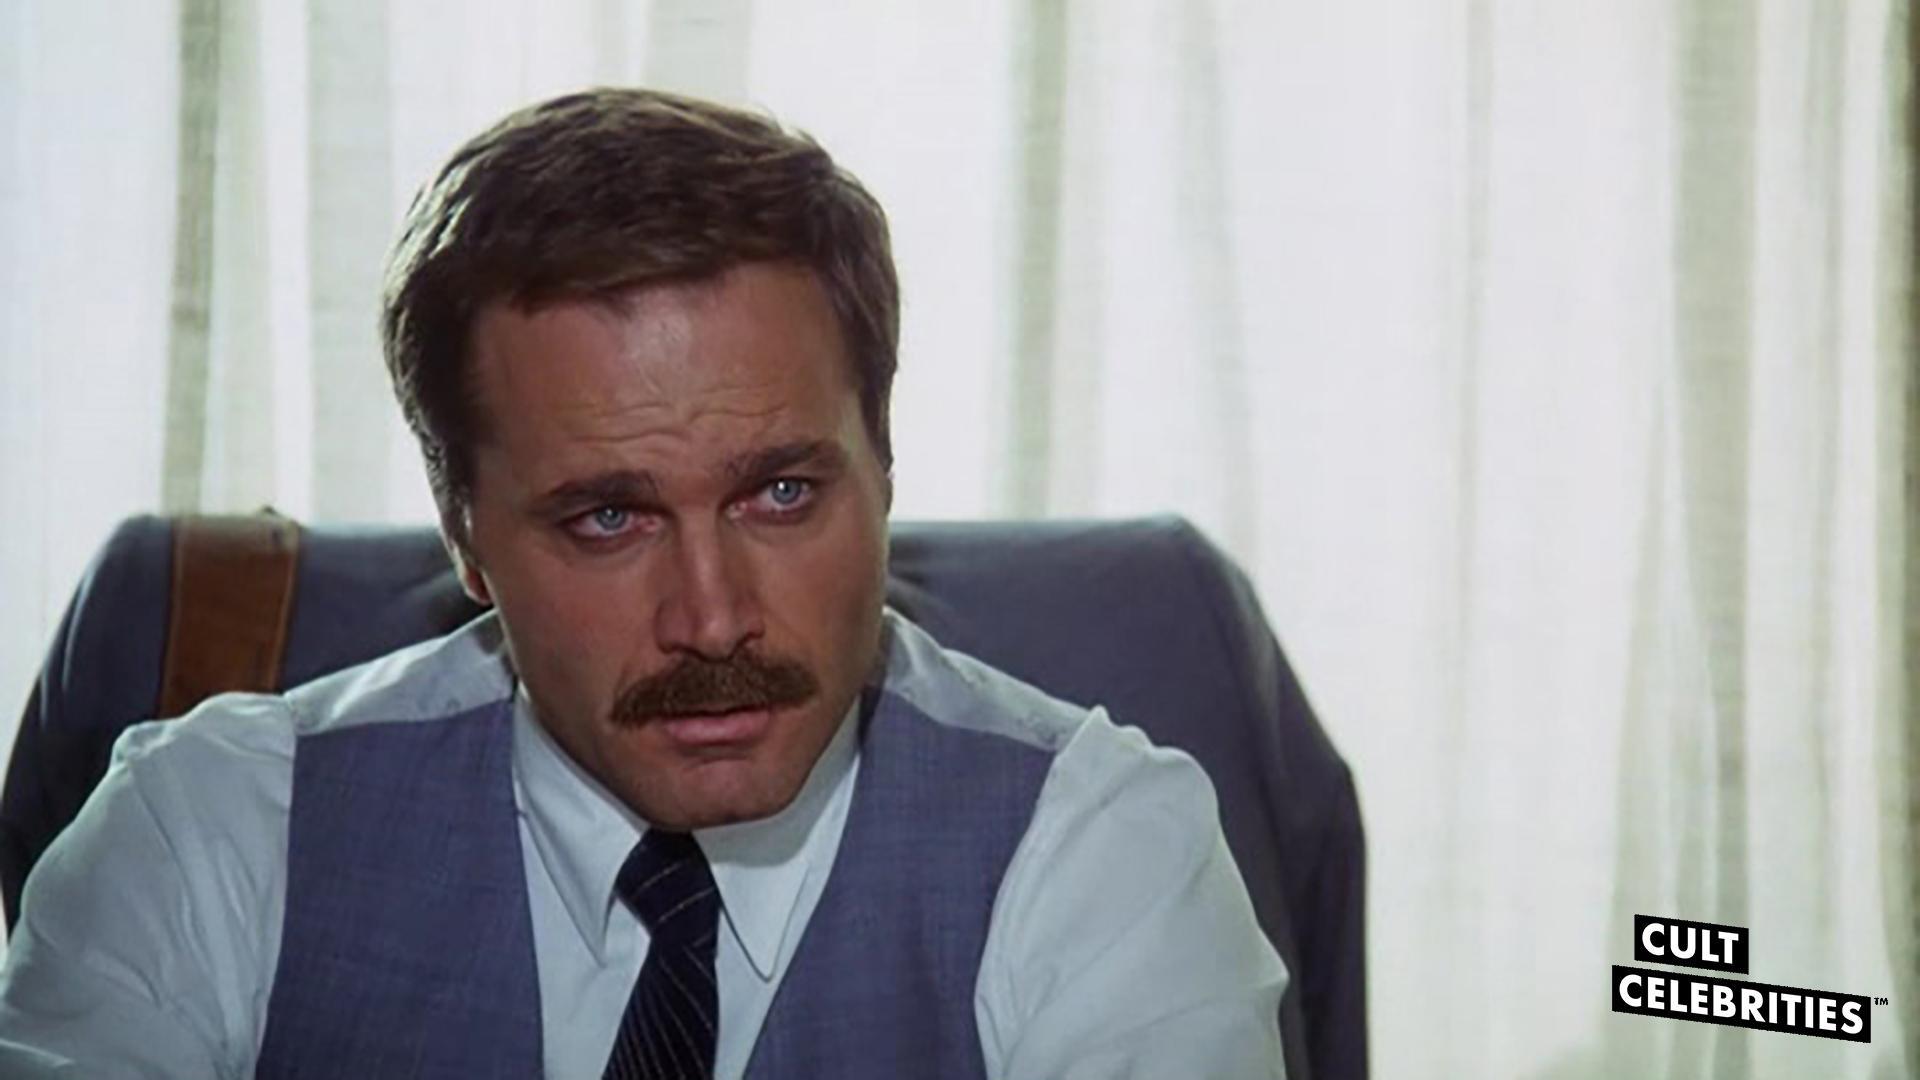 Franco Nero in The Salamander (1981)